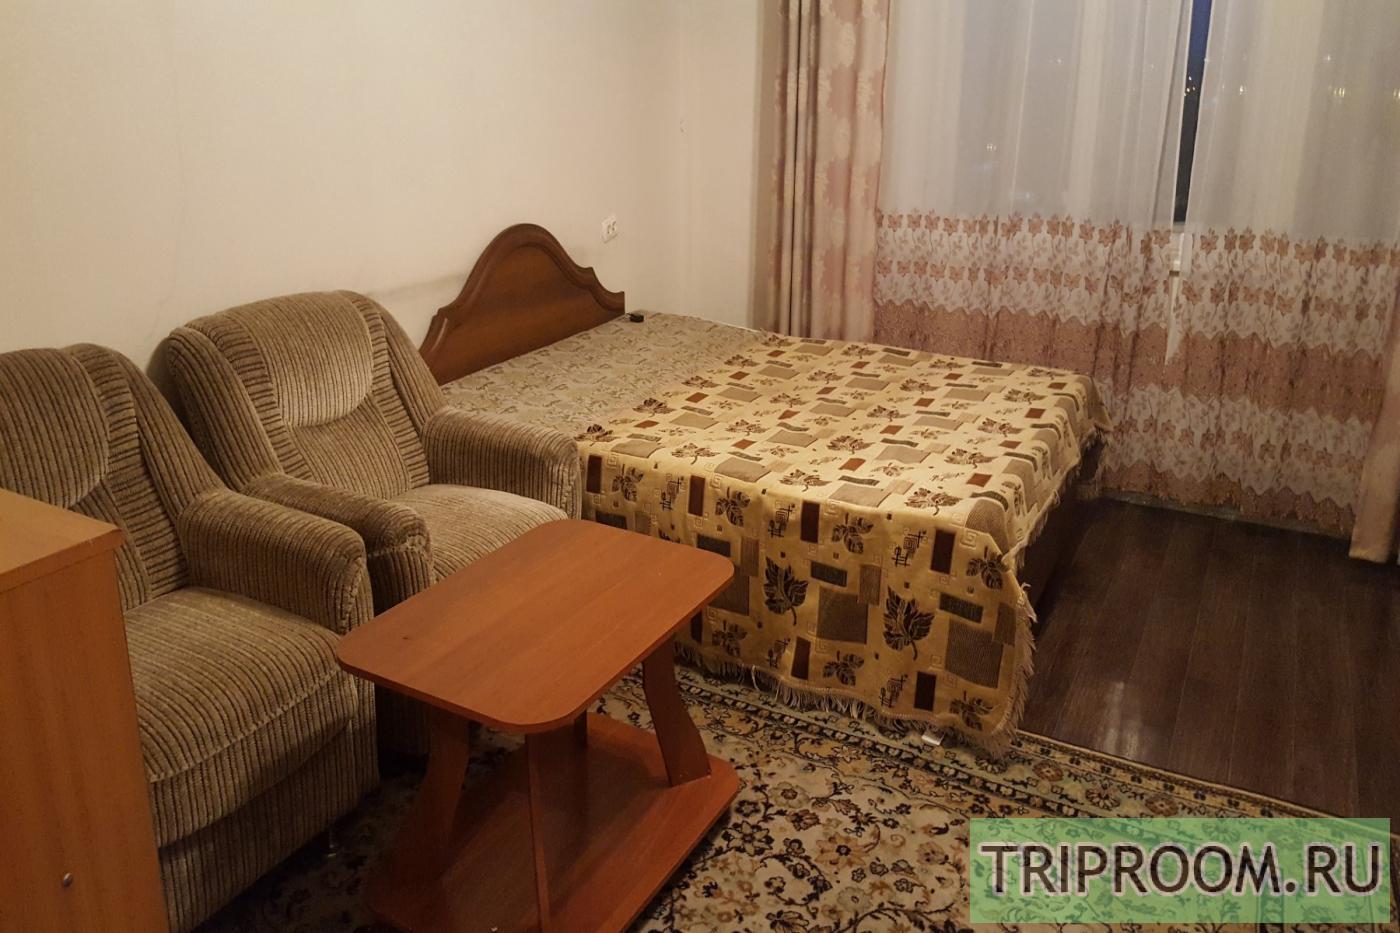 1-комнатная квартира посуточно (вариант № 30851), ул. Циолковского улица, фото № 1